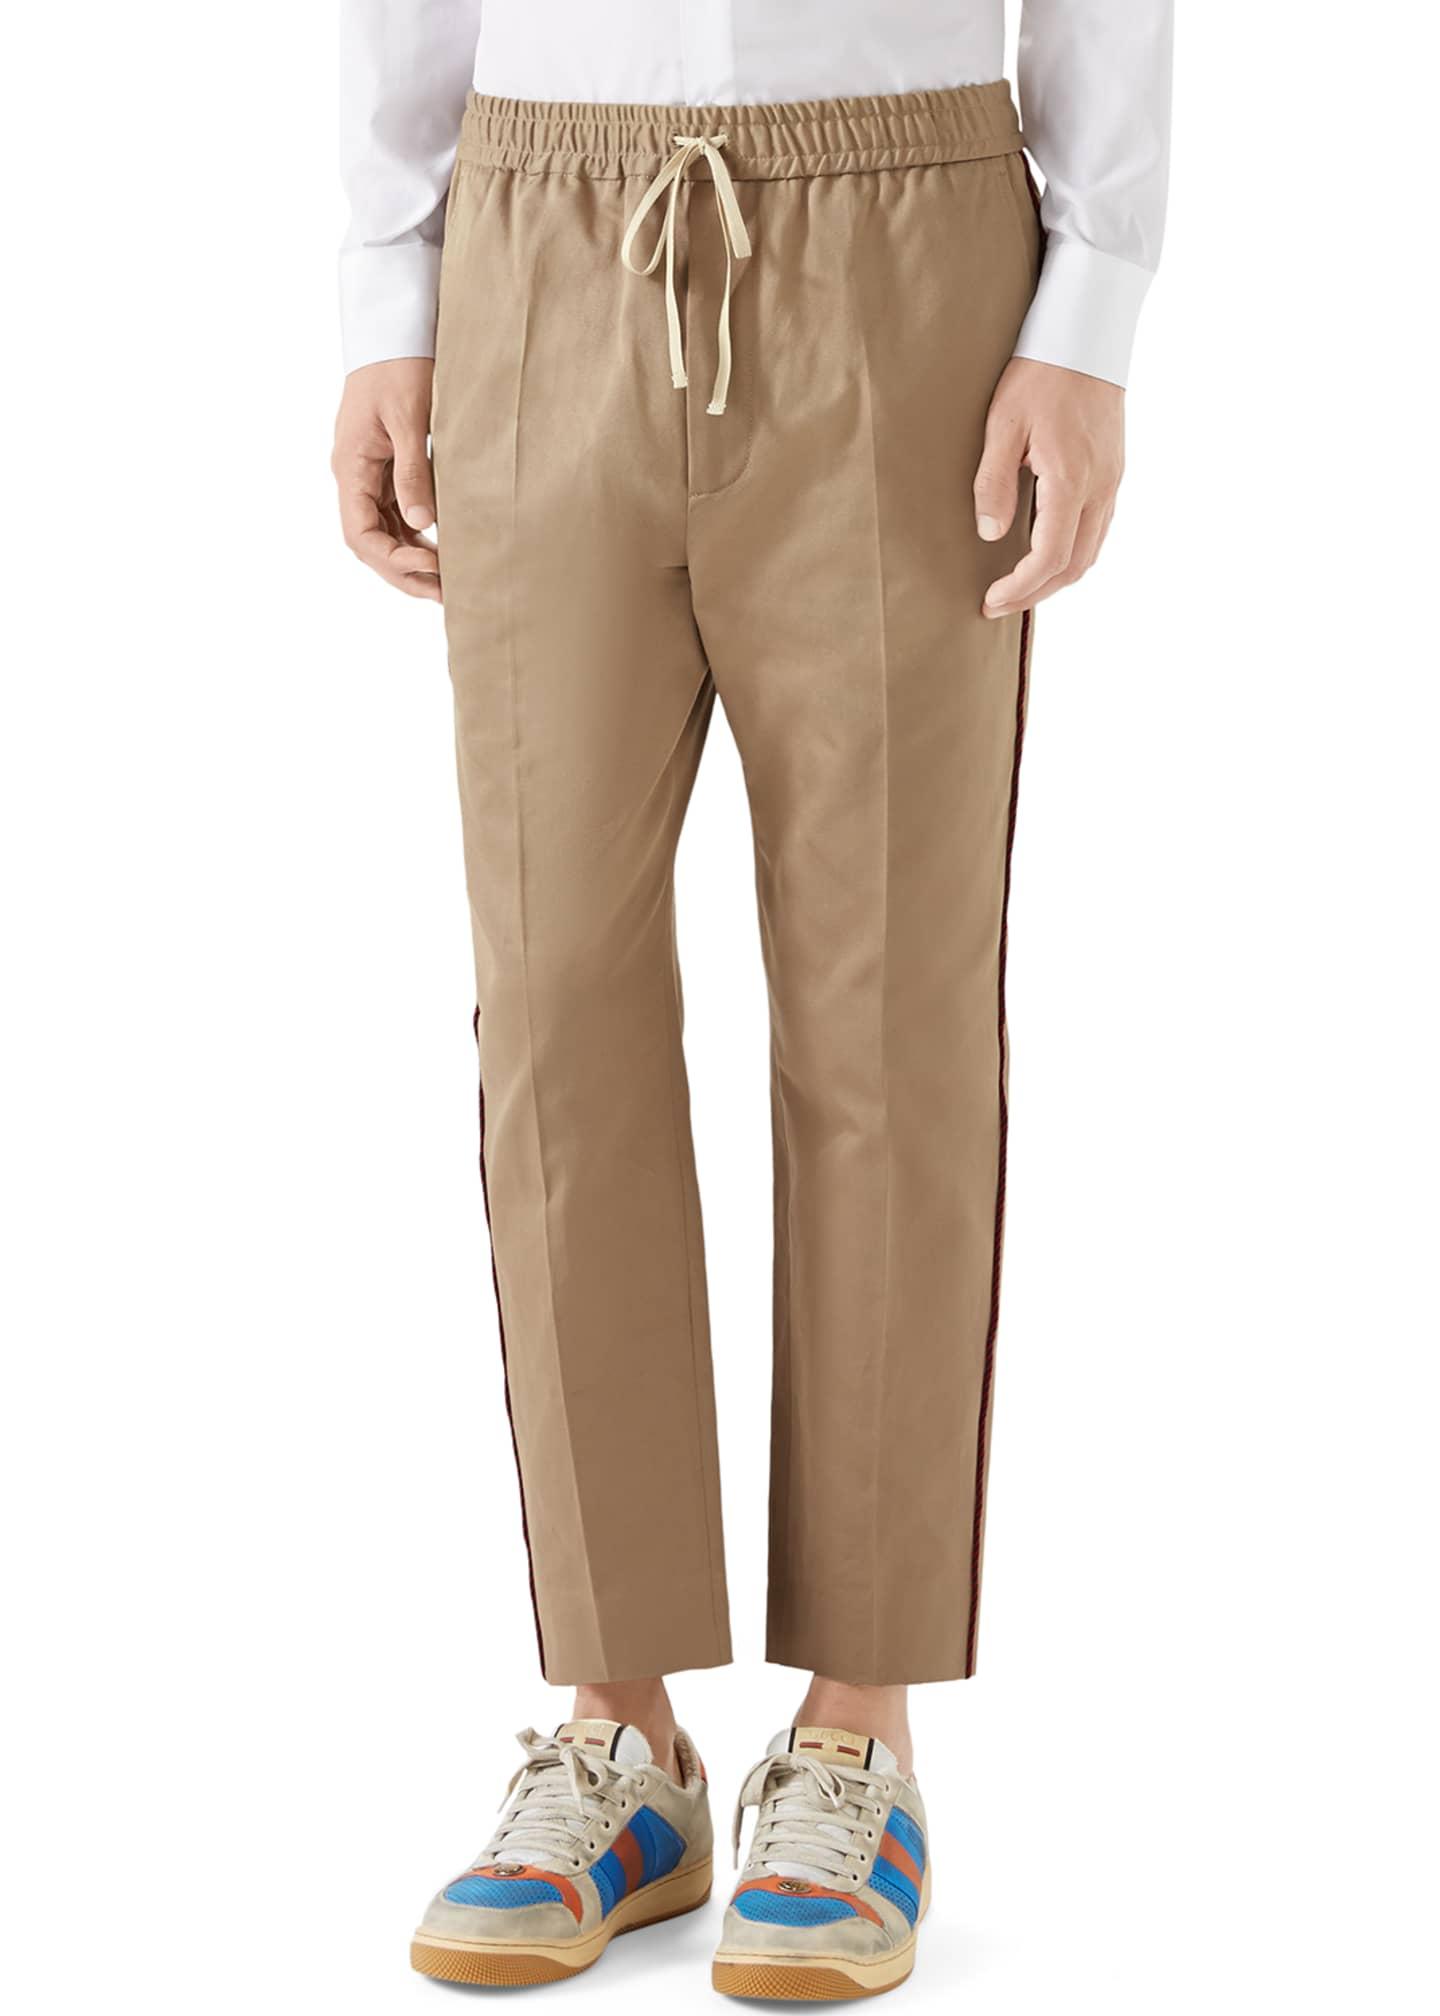 Gucci Men's Rope-Trim Drawstring Chino Pants